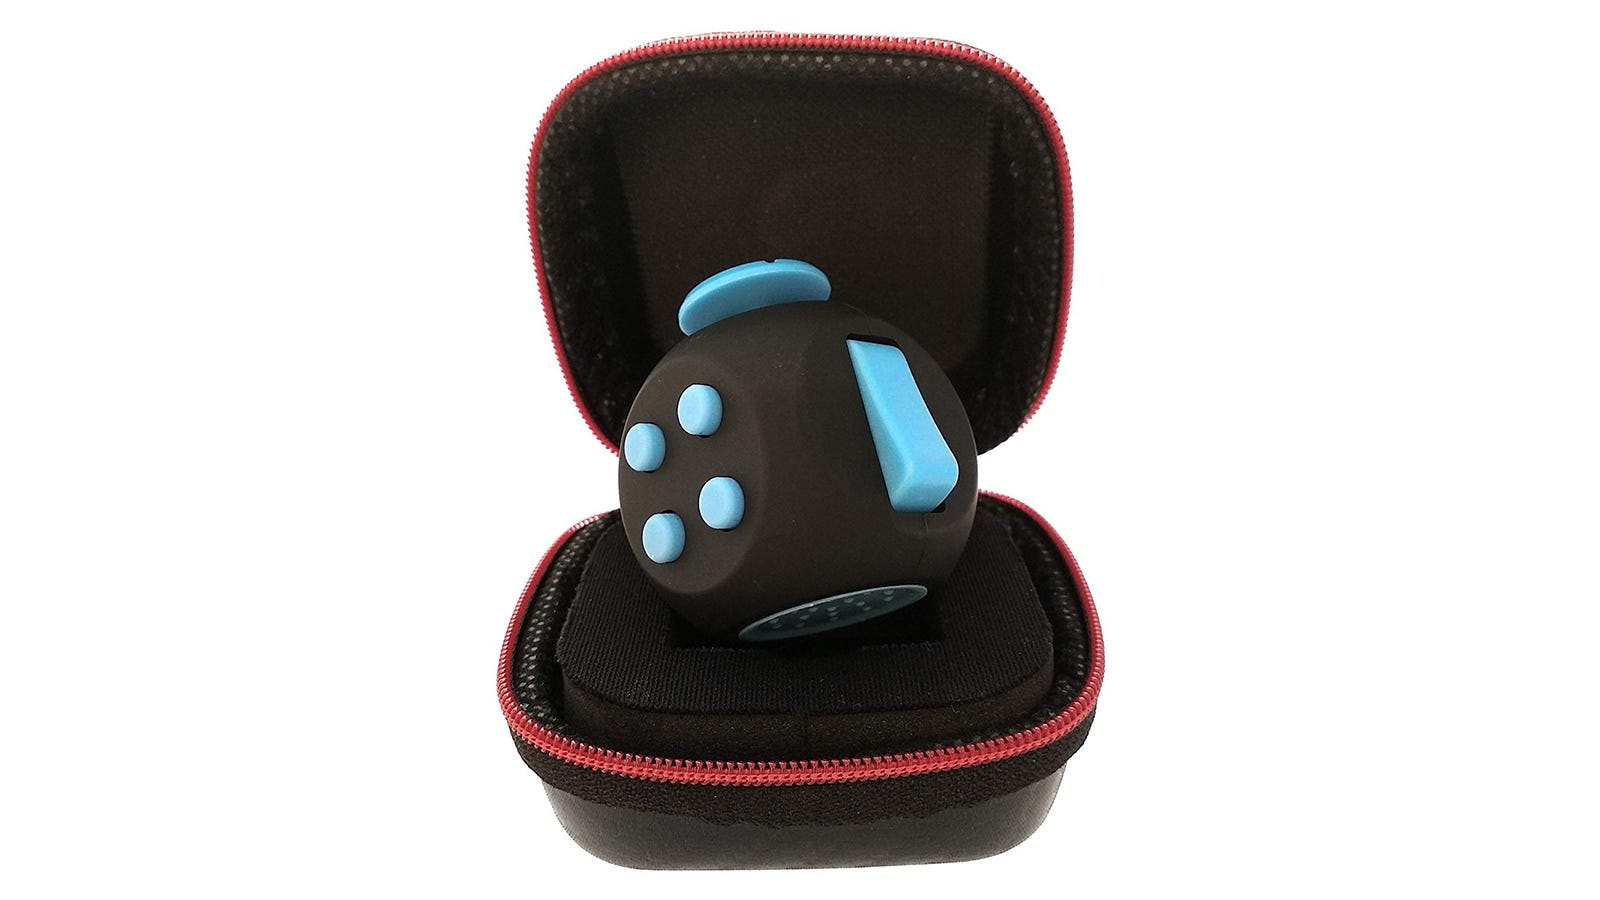 PILPOC theFube Fidget Cube